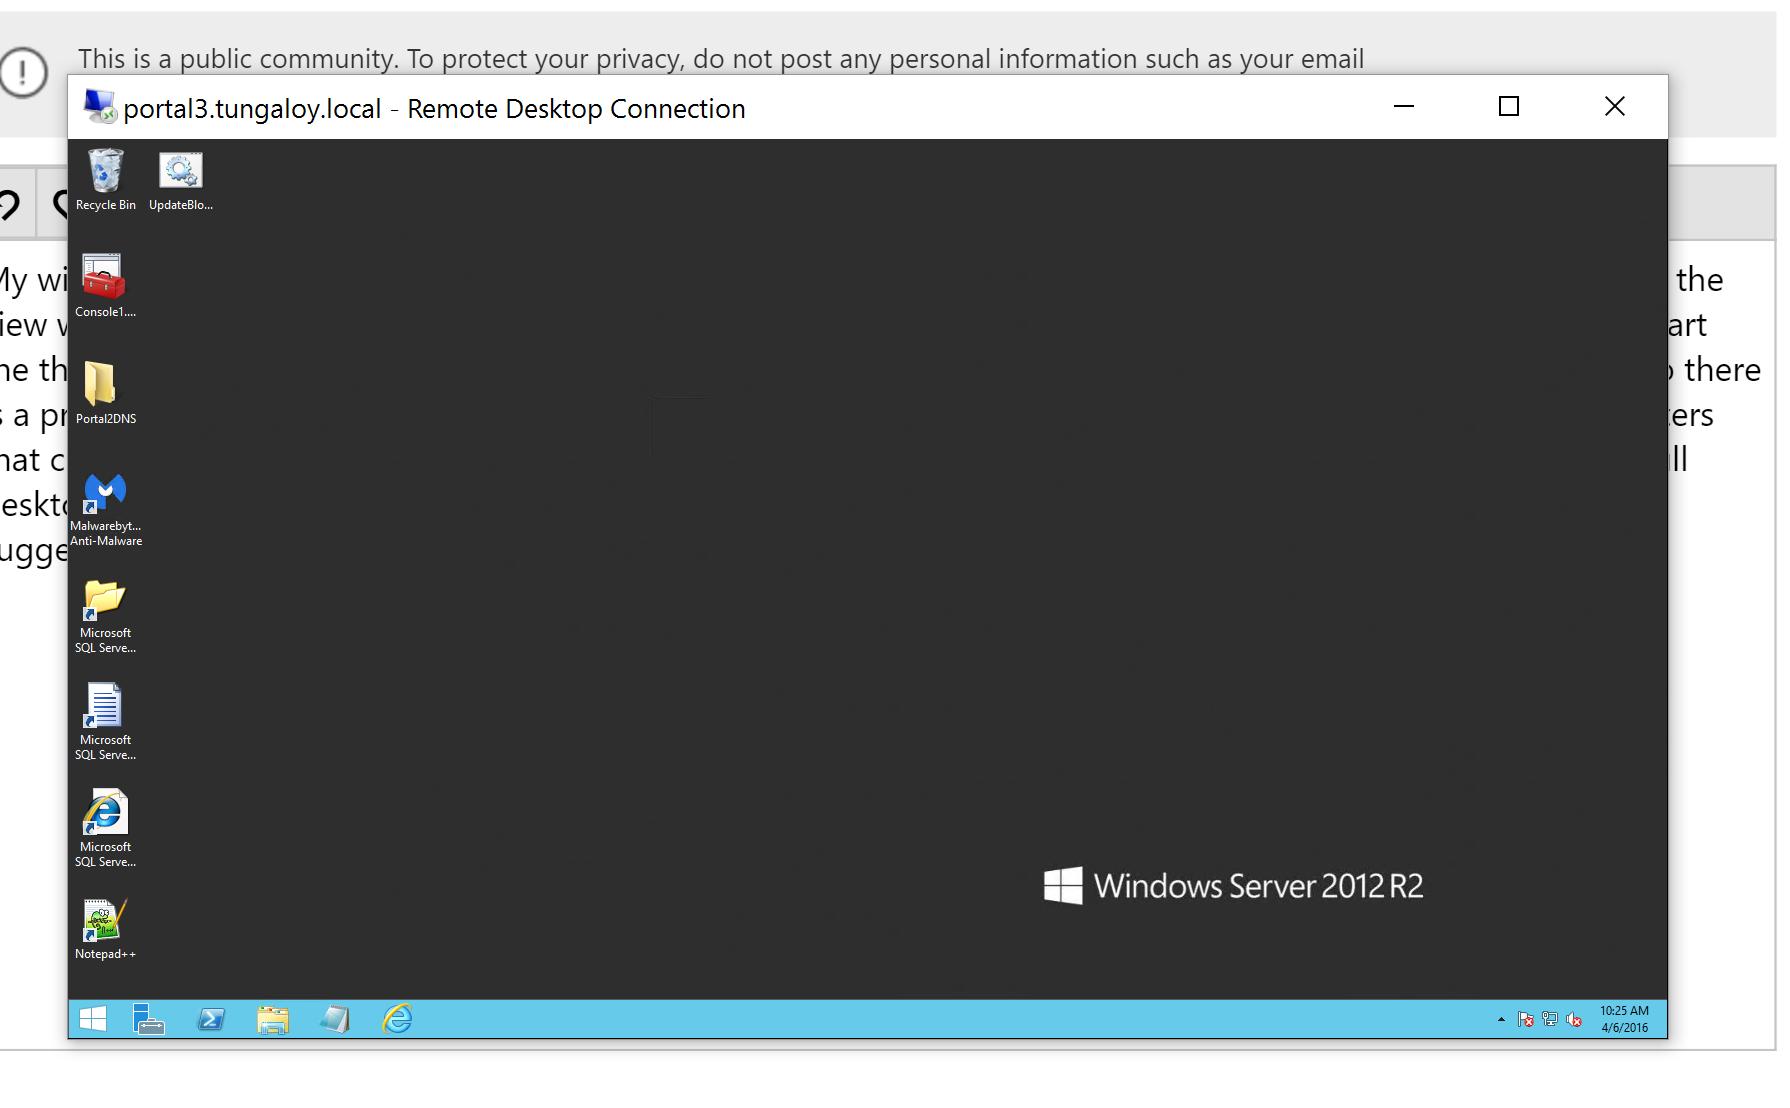 Citaten Zoon Win 10 : Windows remote desktop zoom not correct